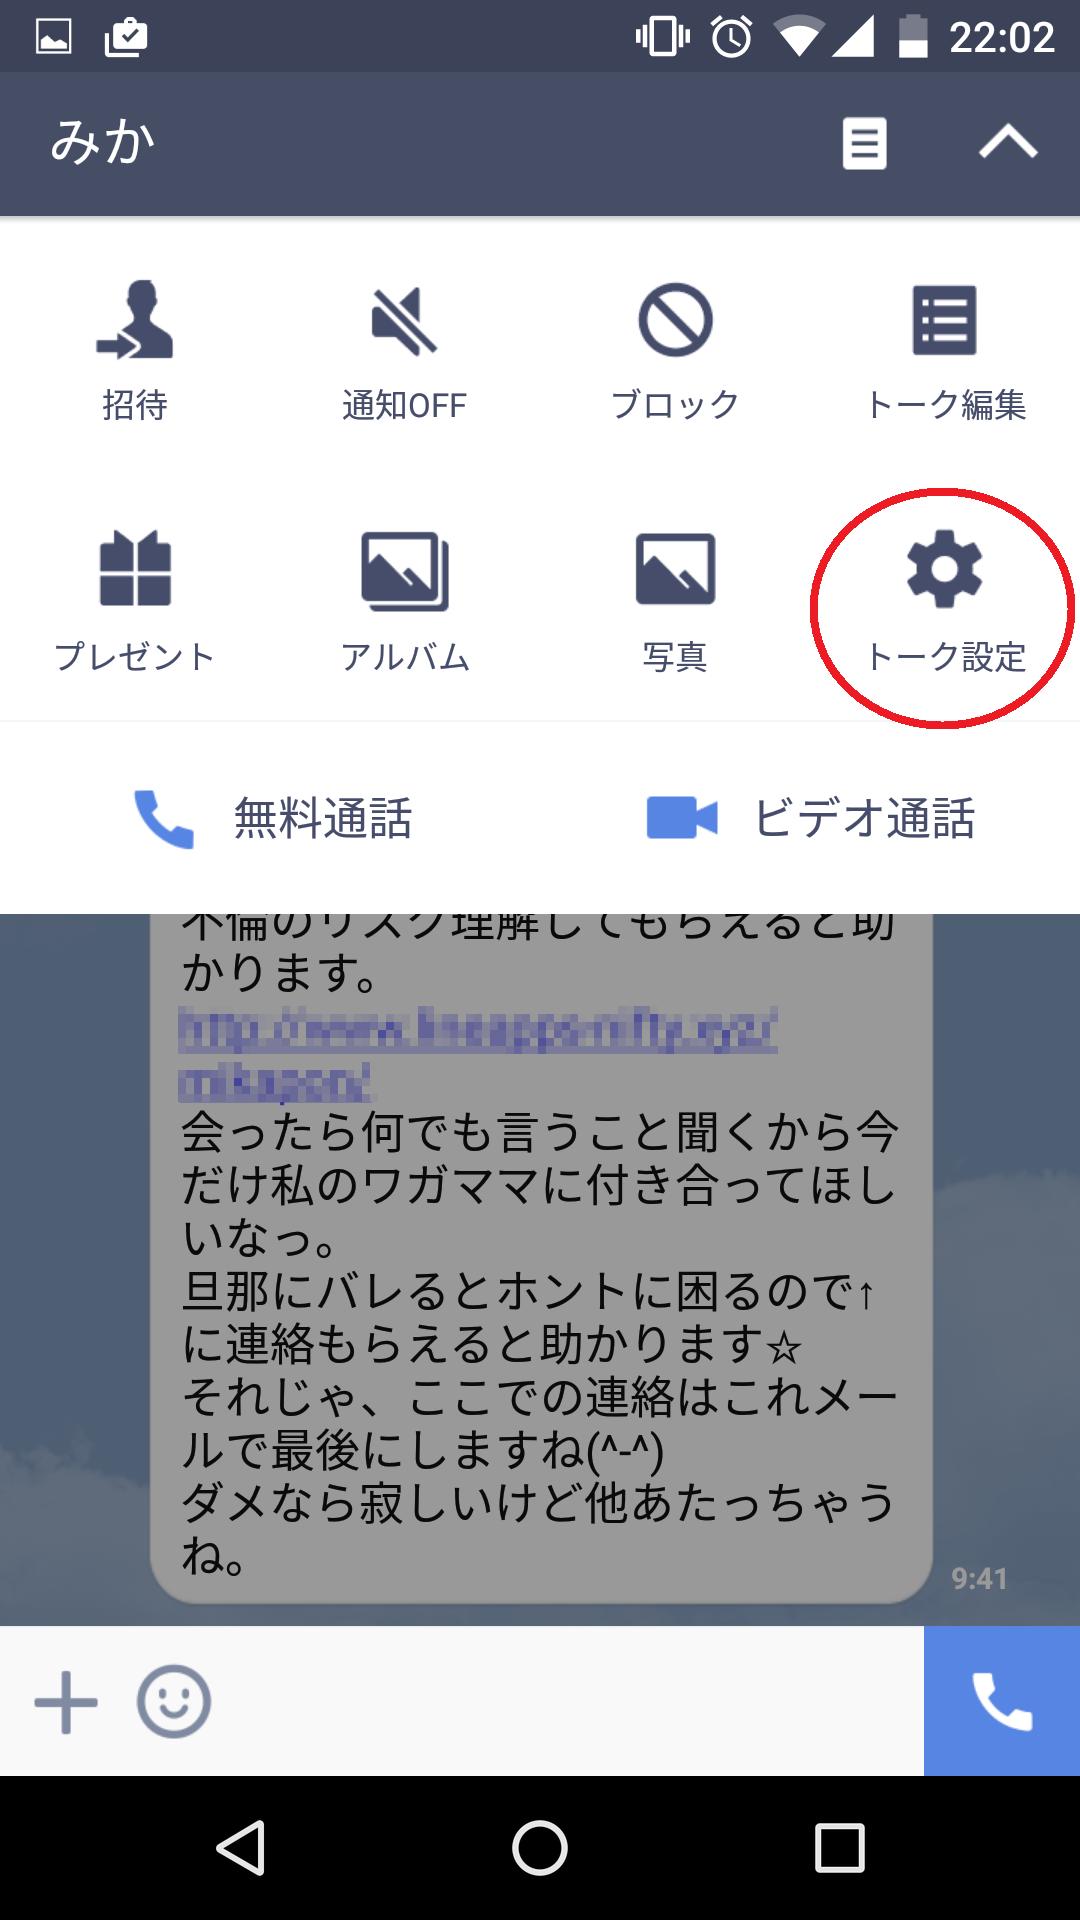 Screenshot_20160223-220202